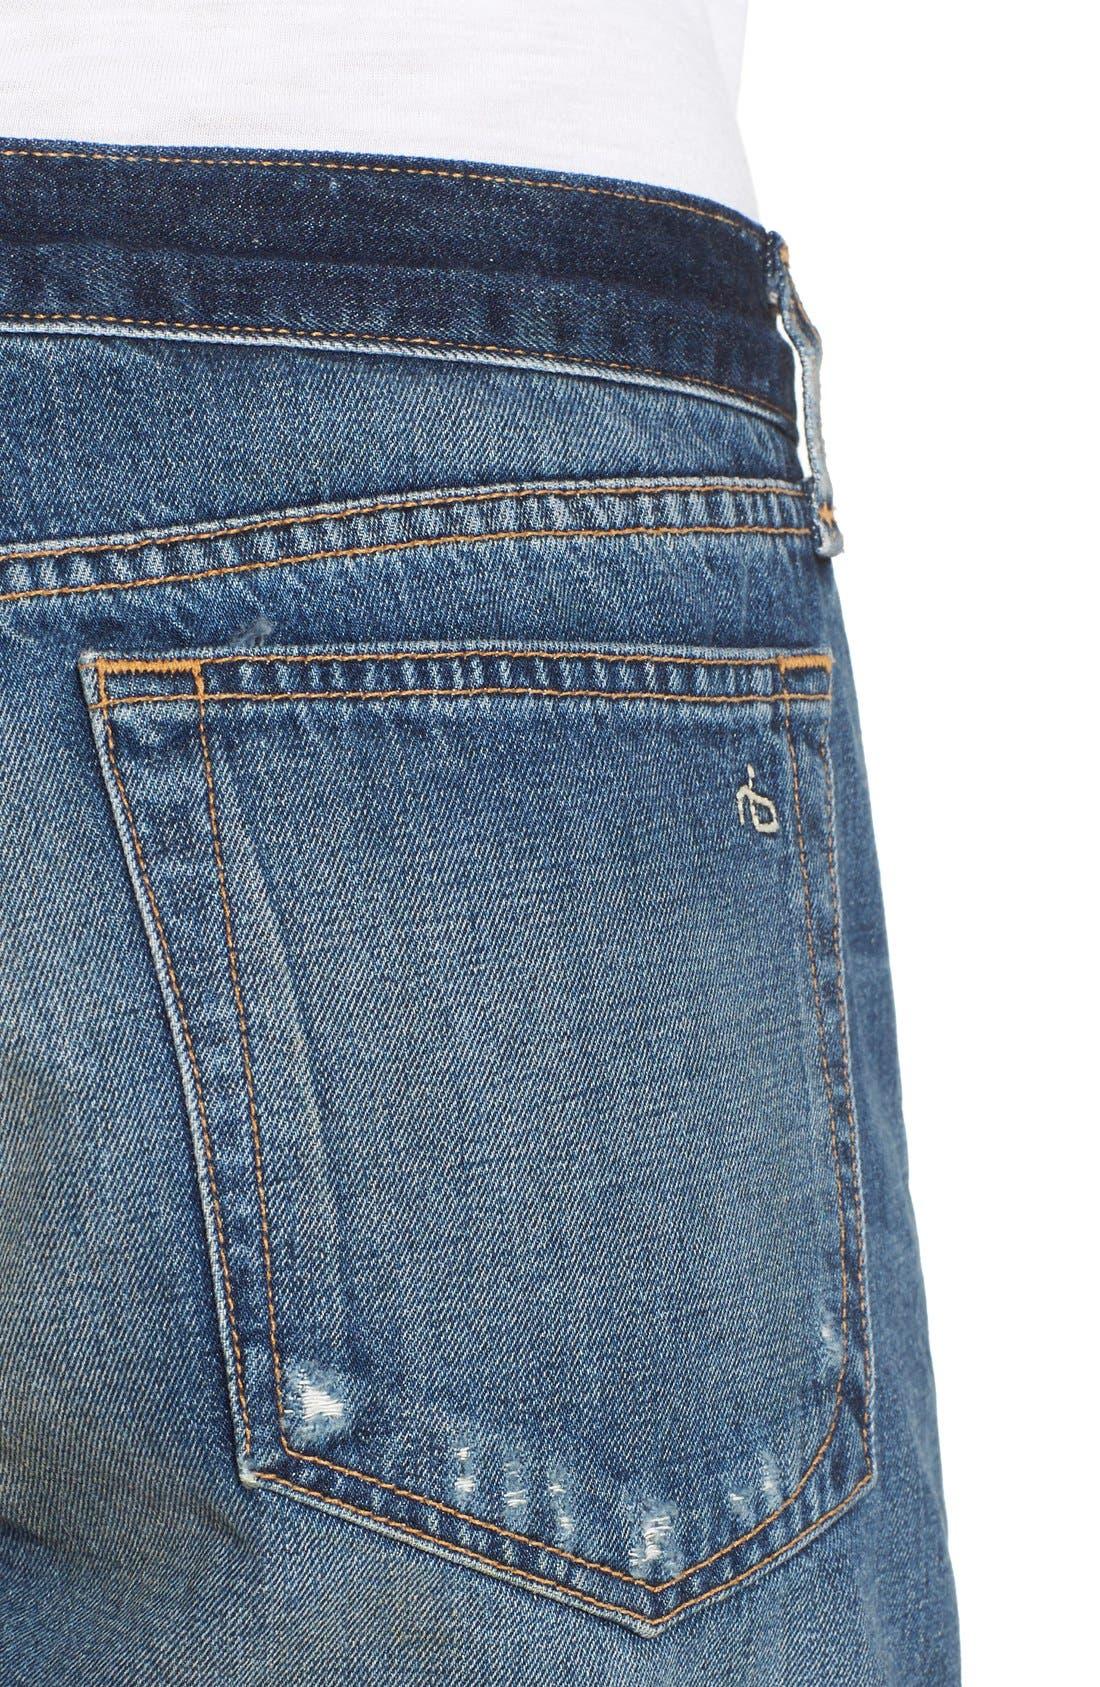 rag & bone 'Boyfriend' Cutoff Denim Shorts,                             Alternate thumbnail 5, color,                             424